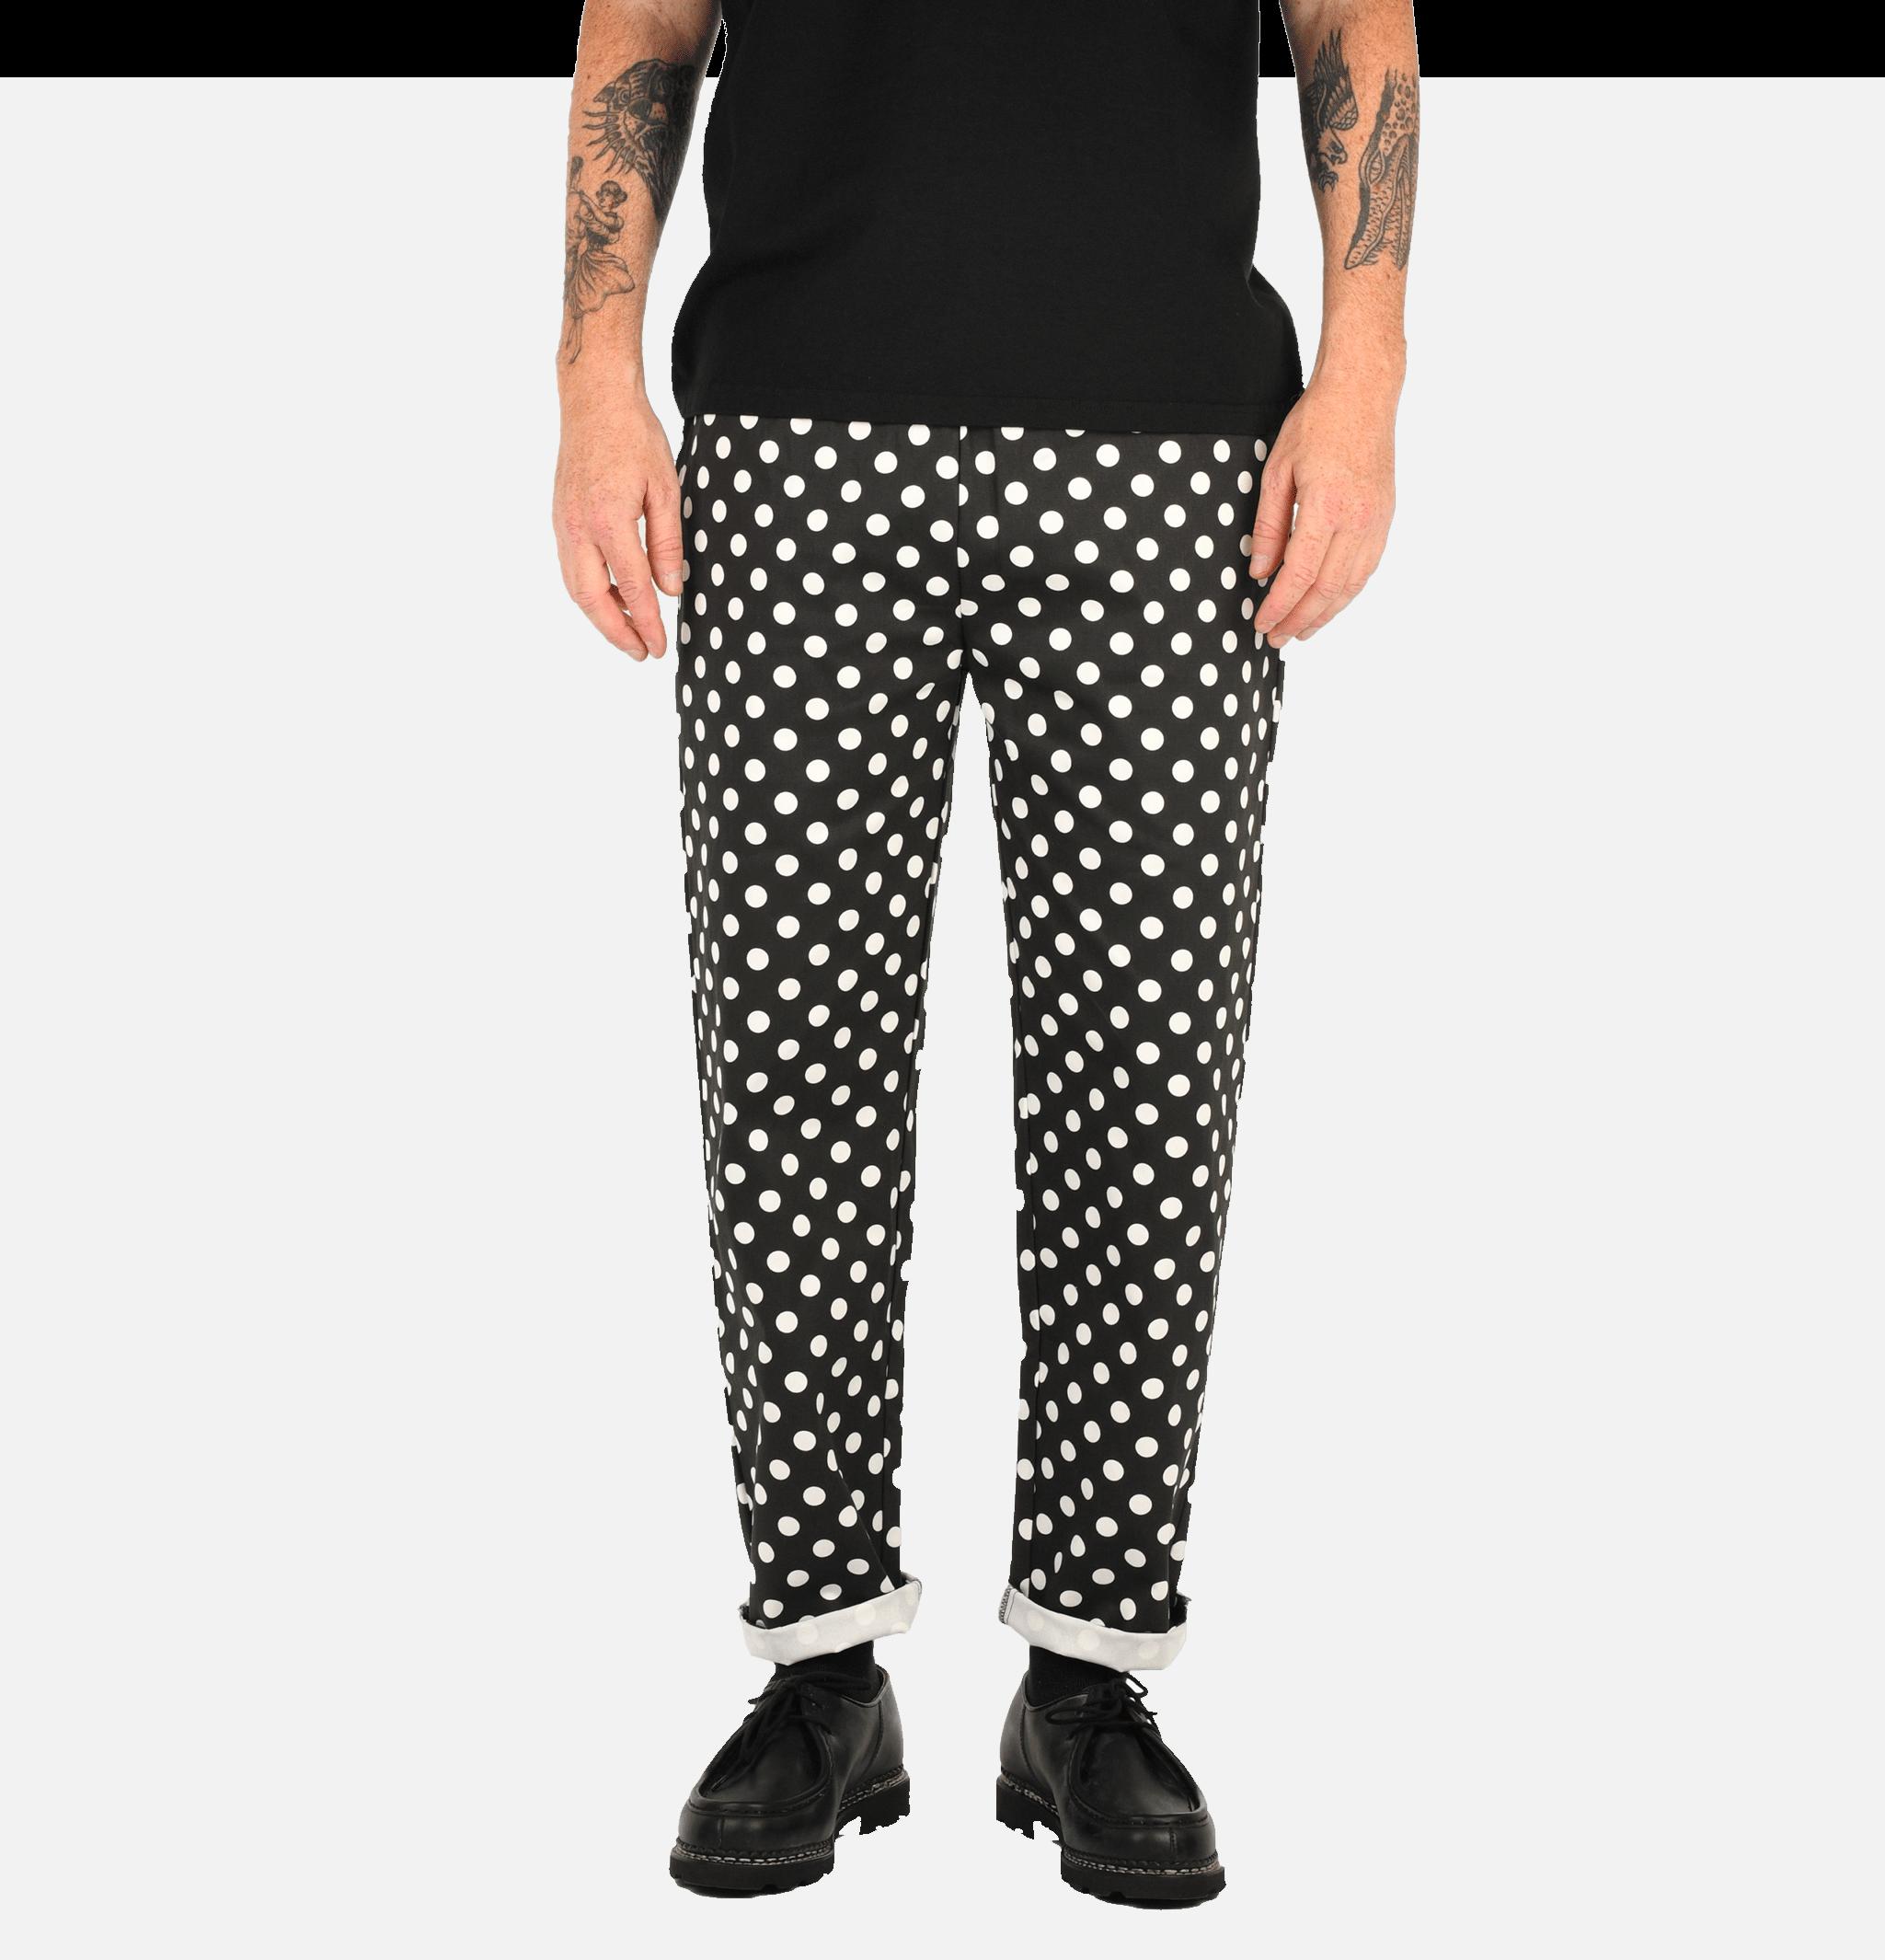 Chef Pants Dot Black